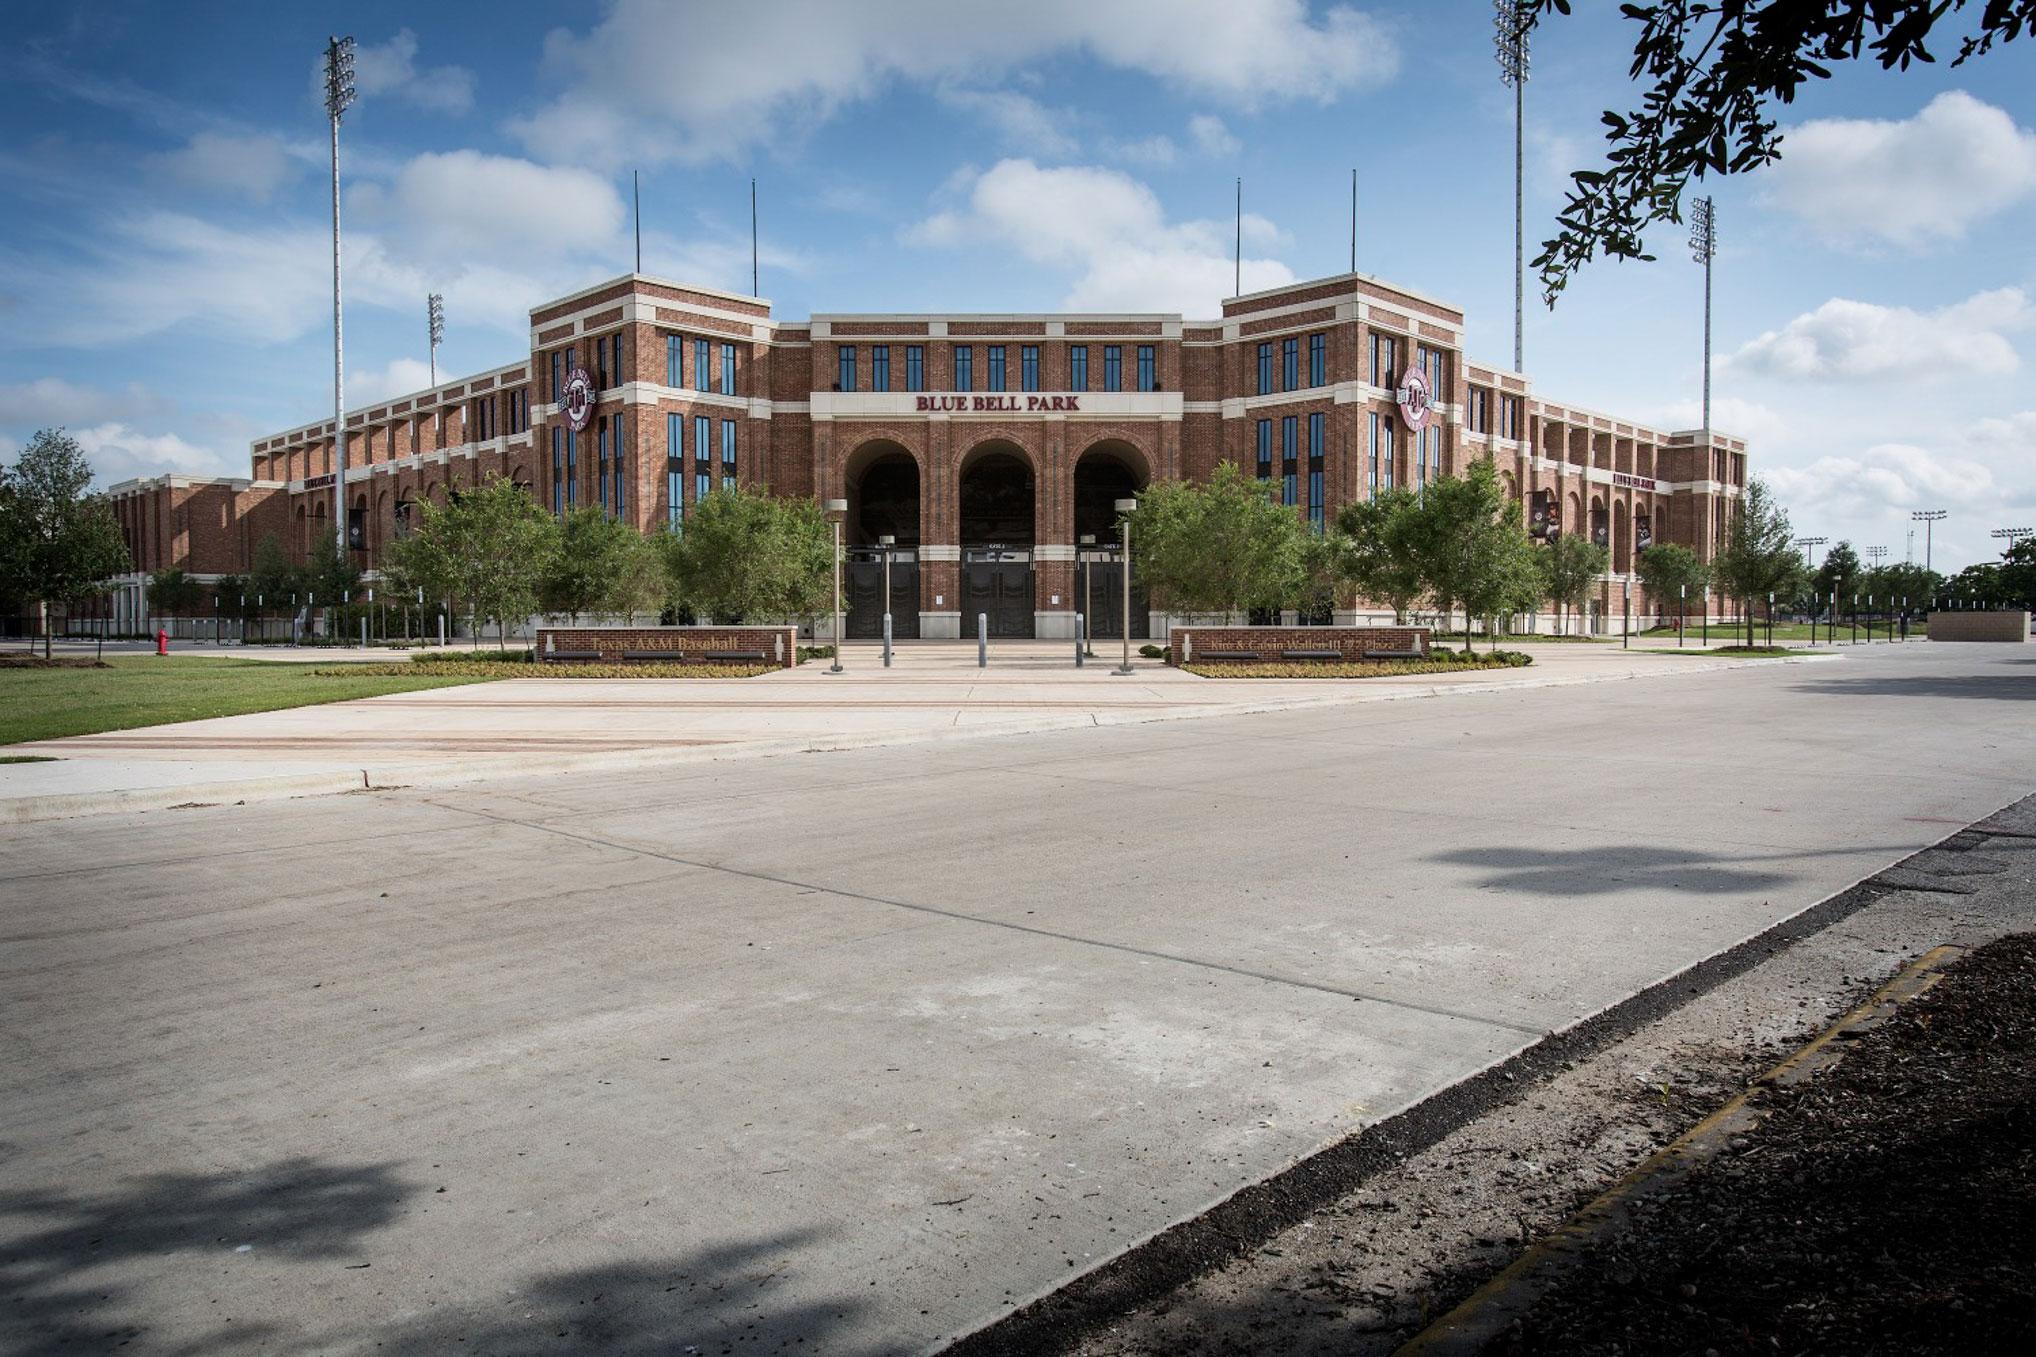 Texas A&M University Blue Bell Park